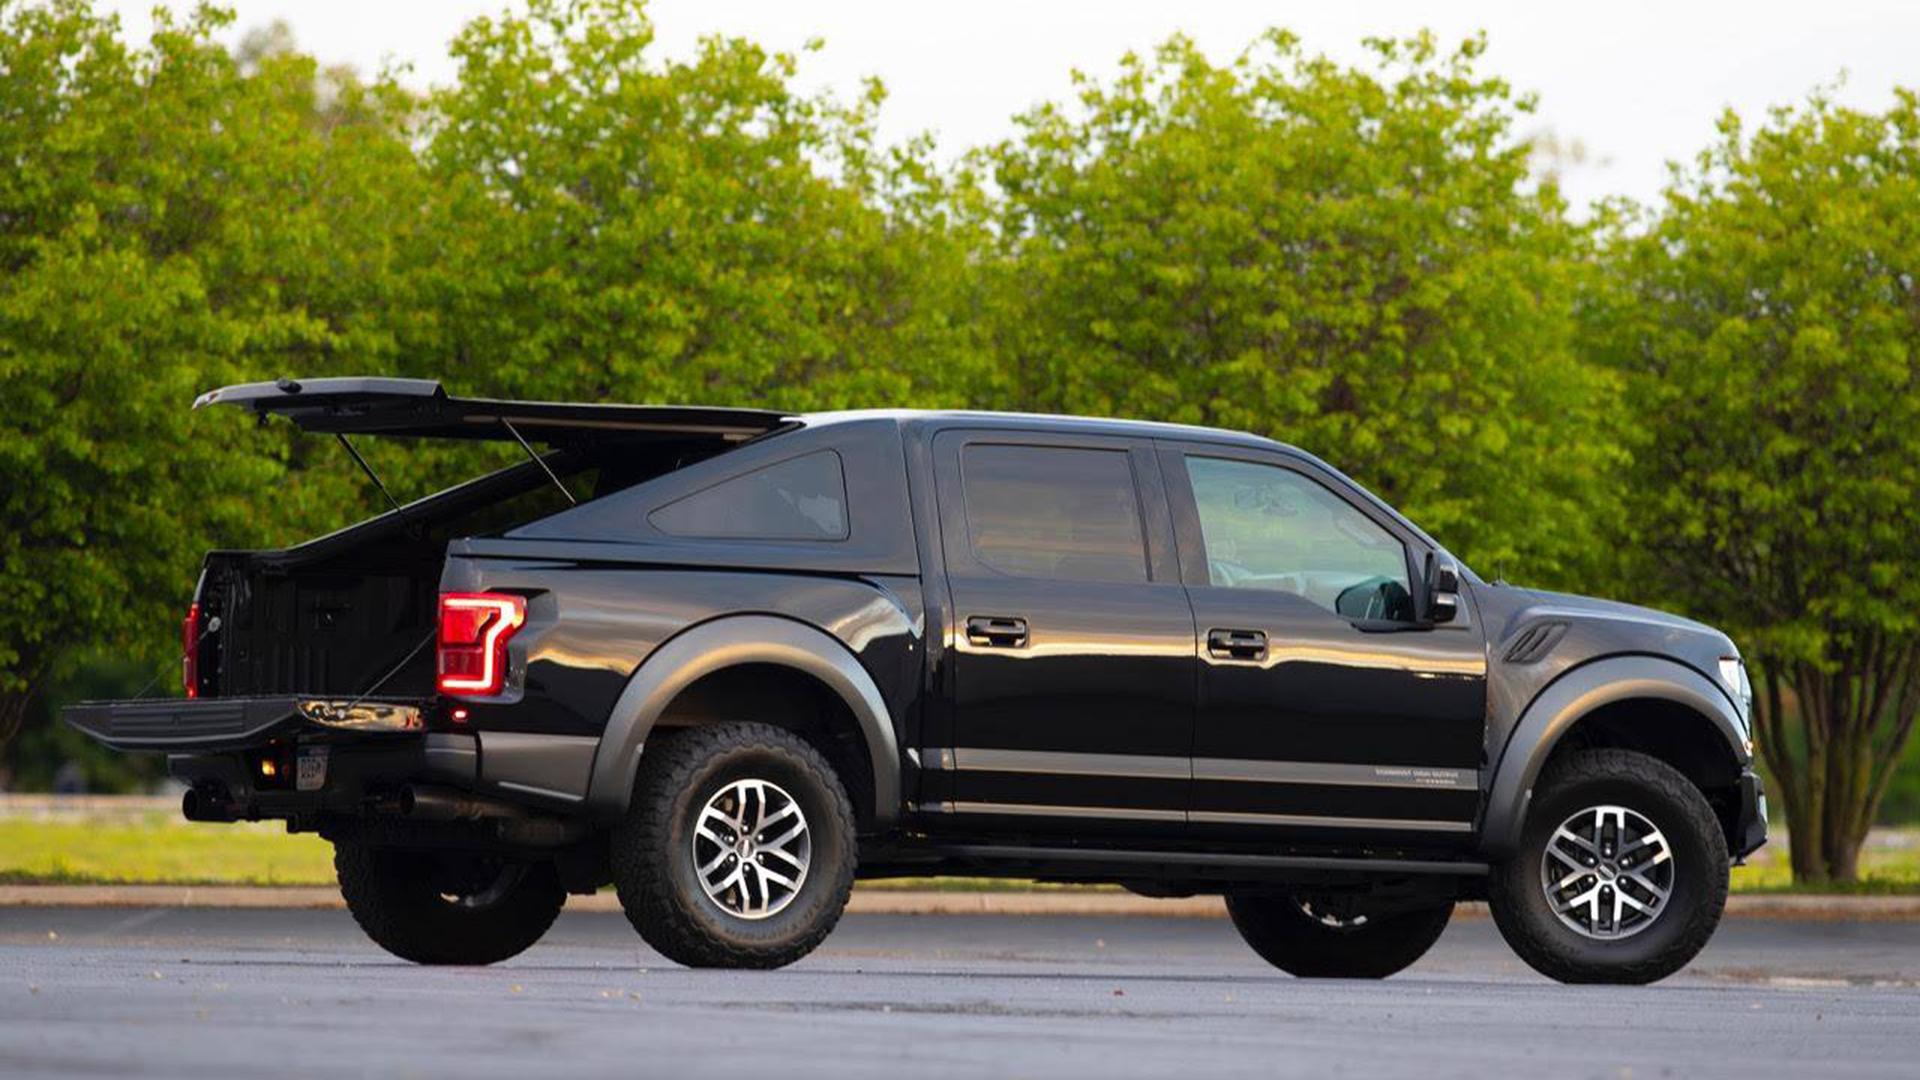 Michigan vehicle solutions